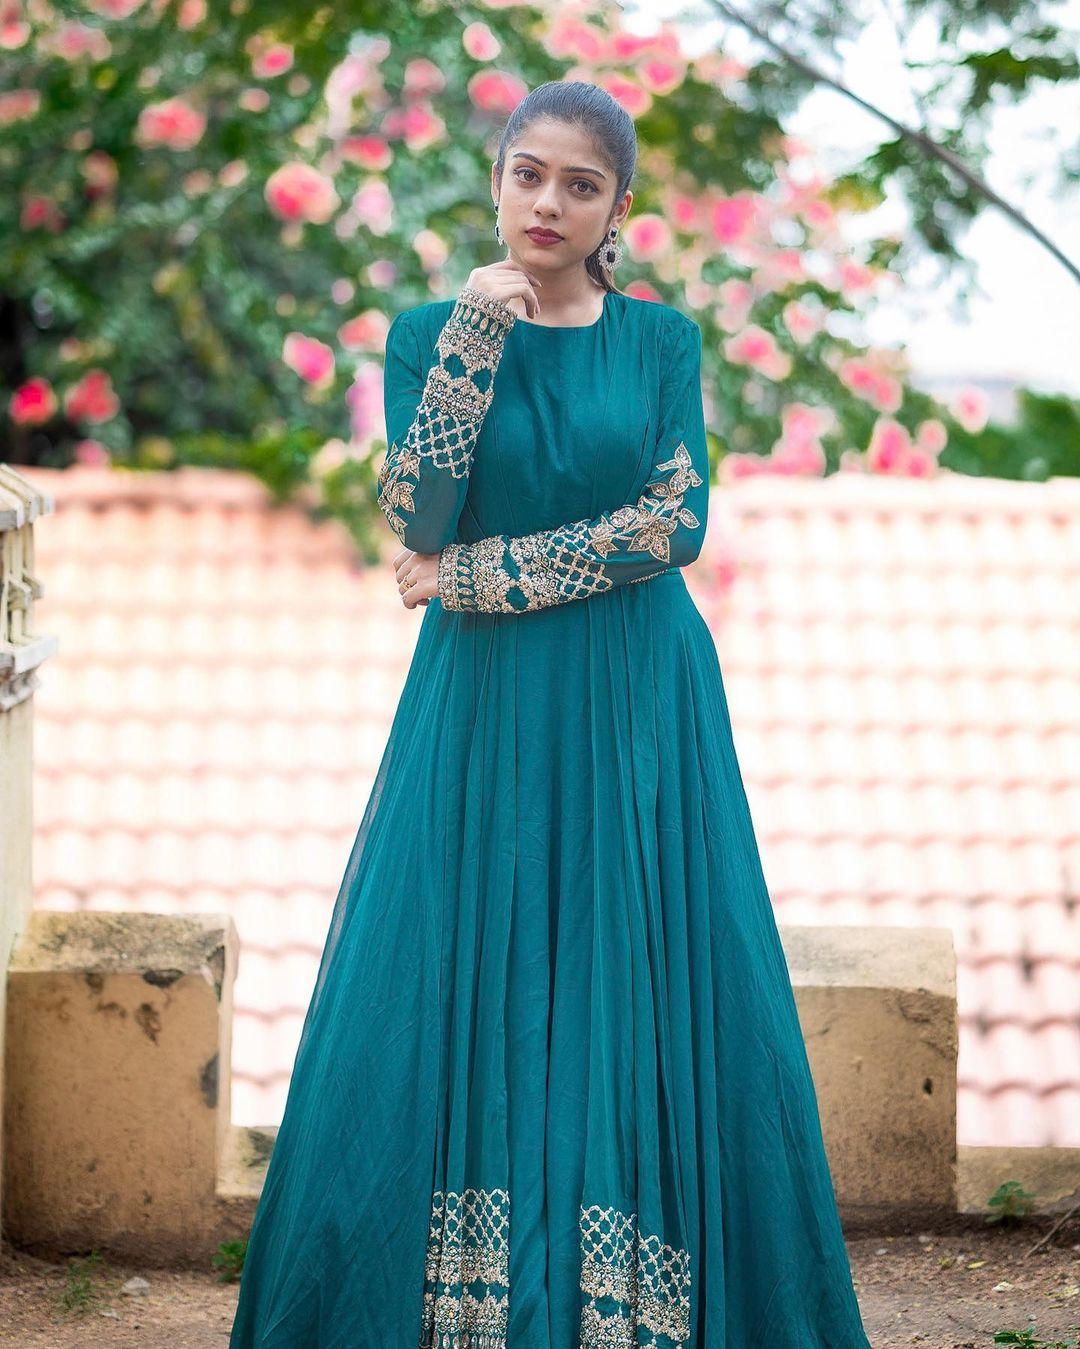 Telugu Actress Varsha Bollamma Hot images, gallery, sexy photos, Movies, News